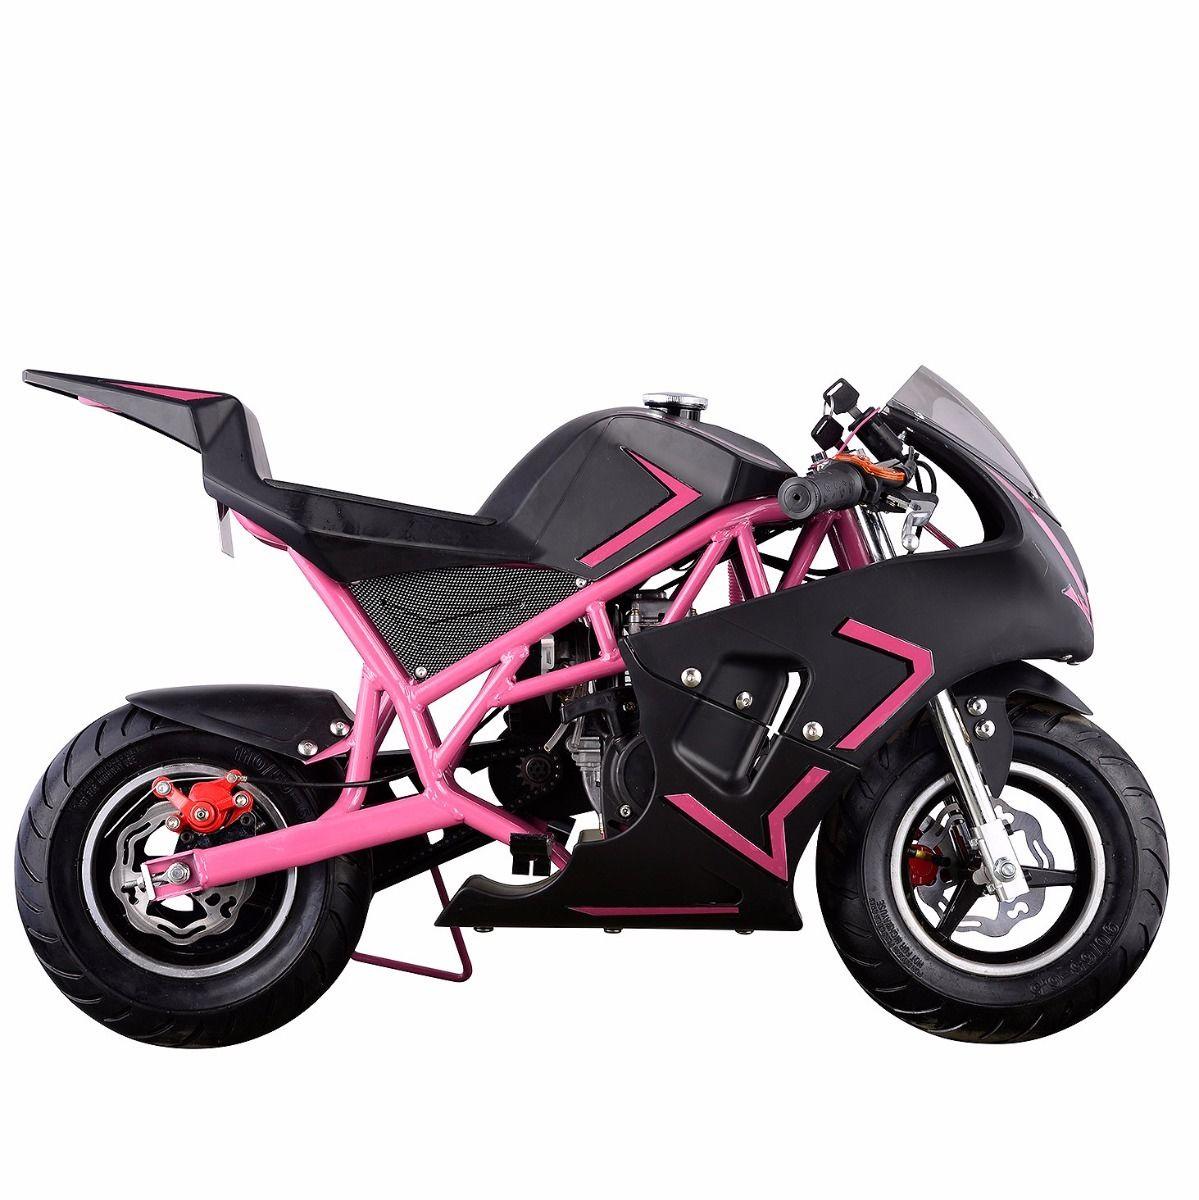 XtremepowerUS-Gas-Pocket-Bike-Motor-Bike-Scooter-40cc-Epa-Engine-Motorcycle thumbnail 20